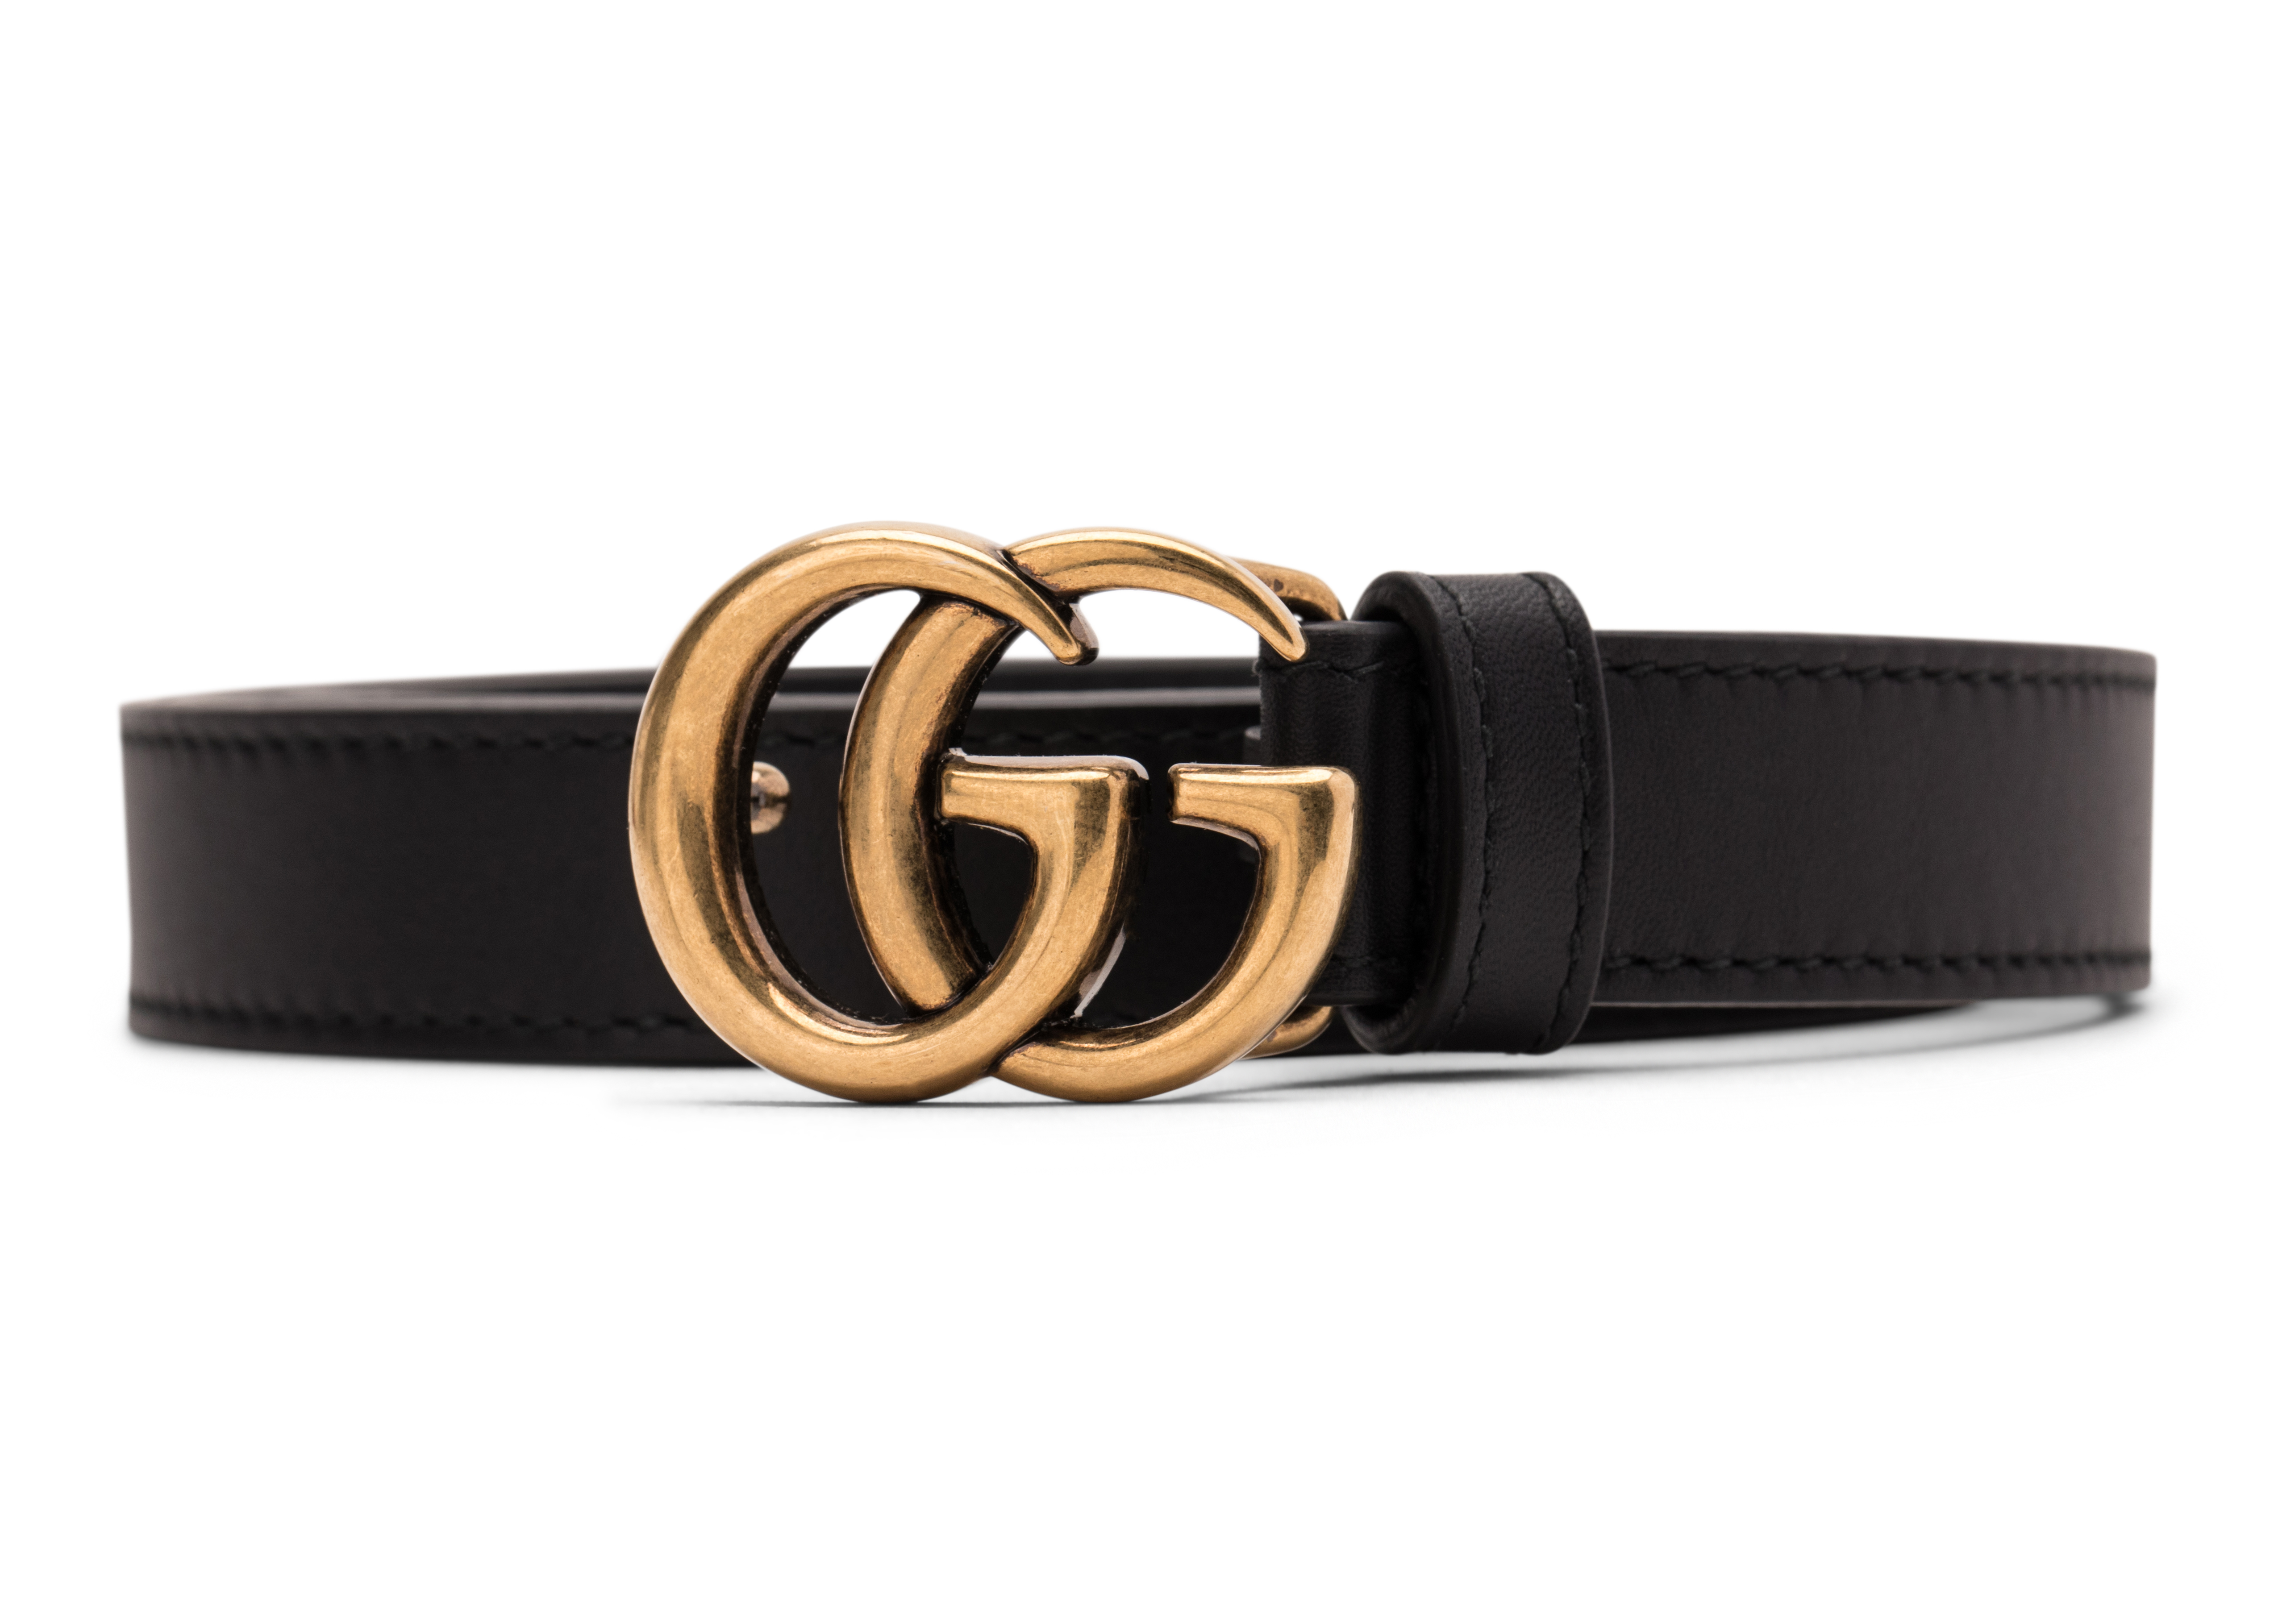 Double G Gold Buckle Leather Belt 0.8 Width Black